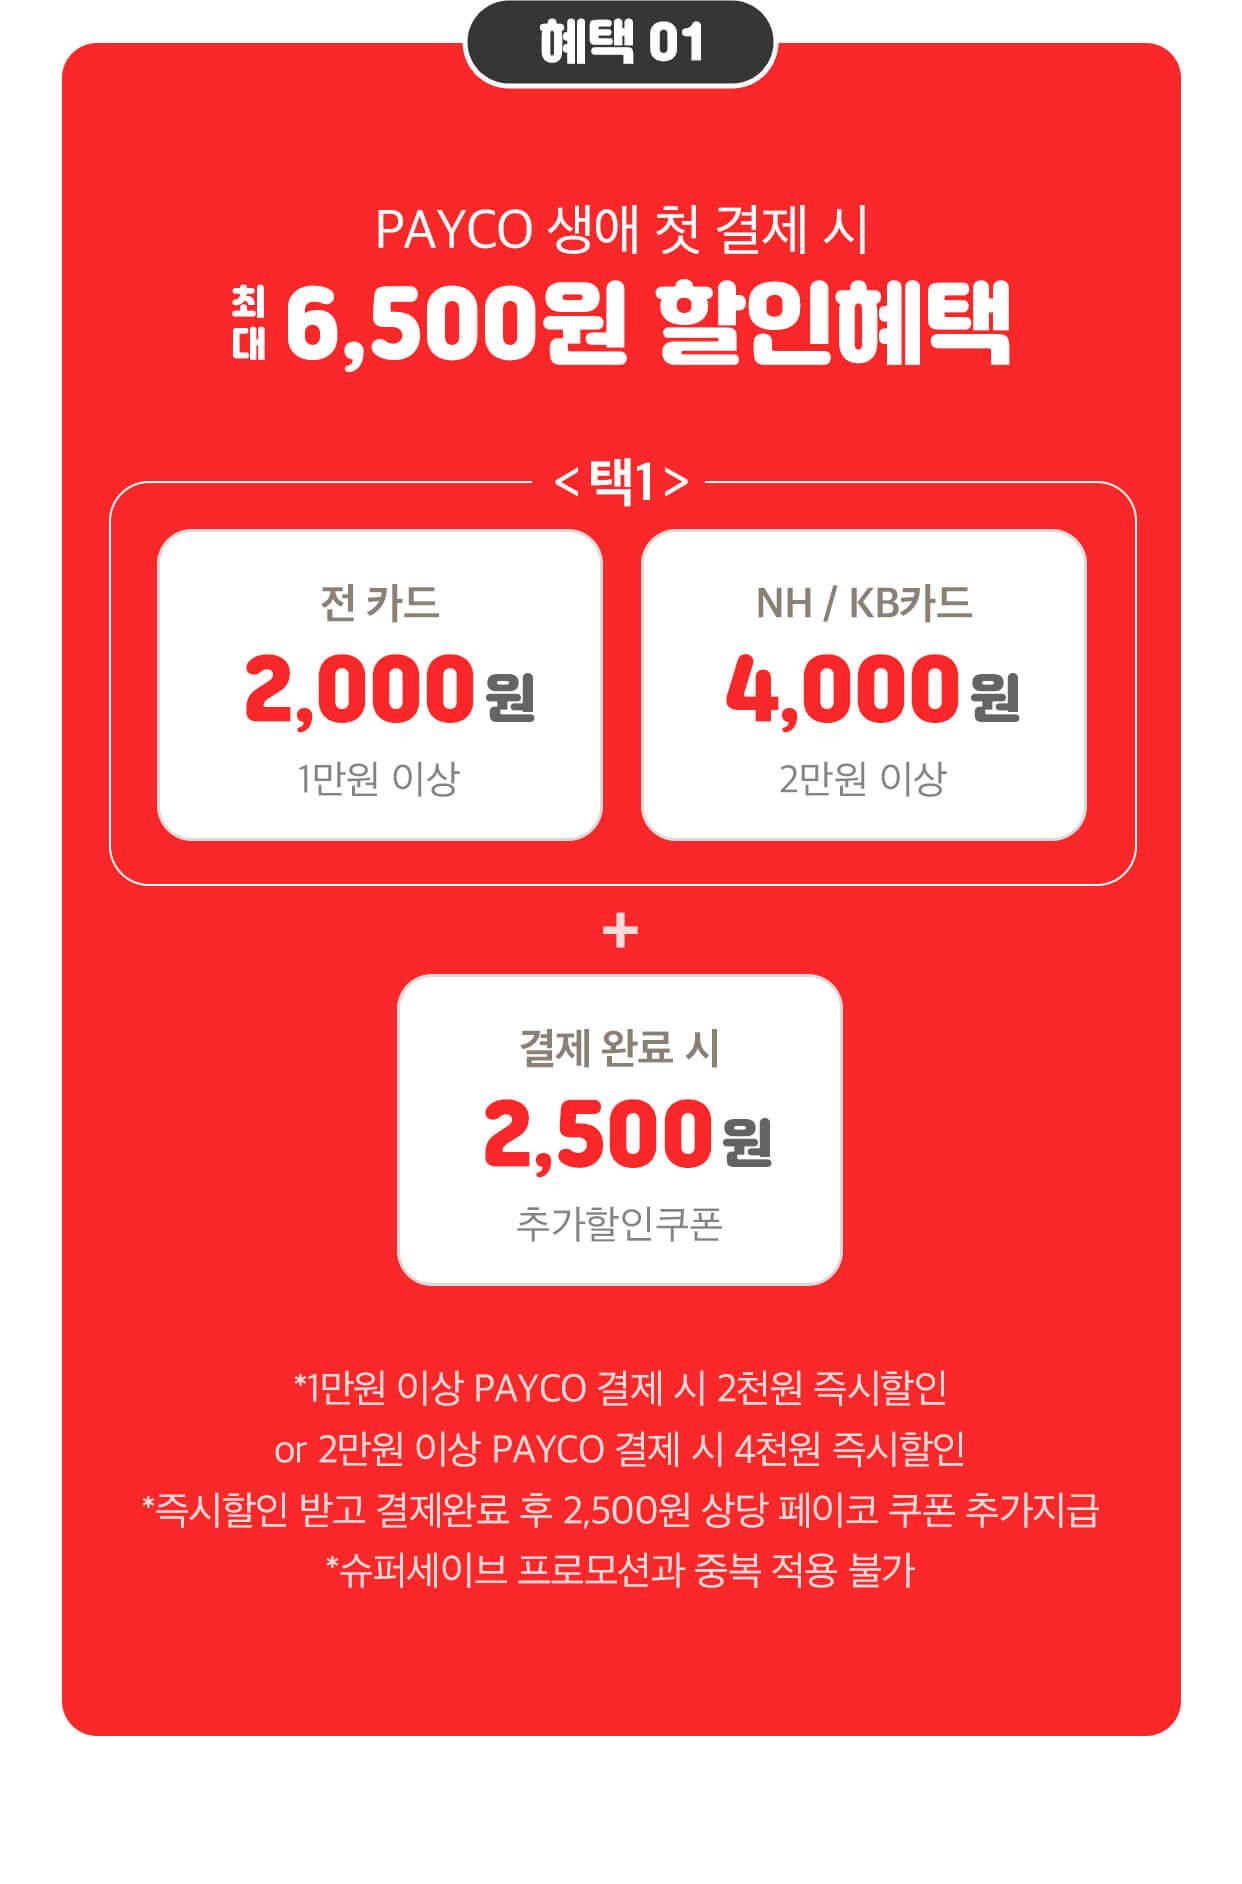 PAYCO 생애 첫 결제 시 최대 6,500원 할인 혜택